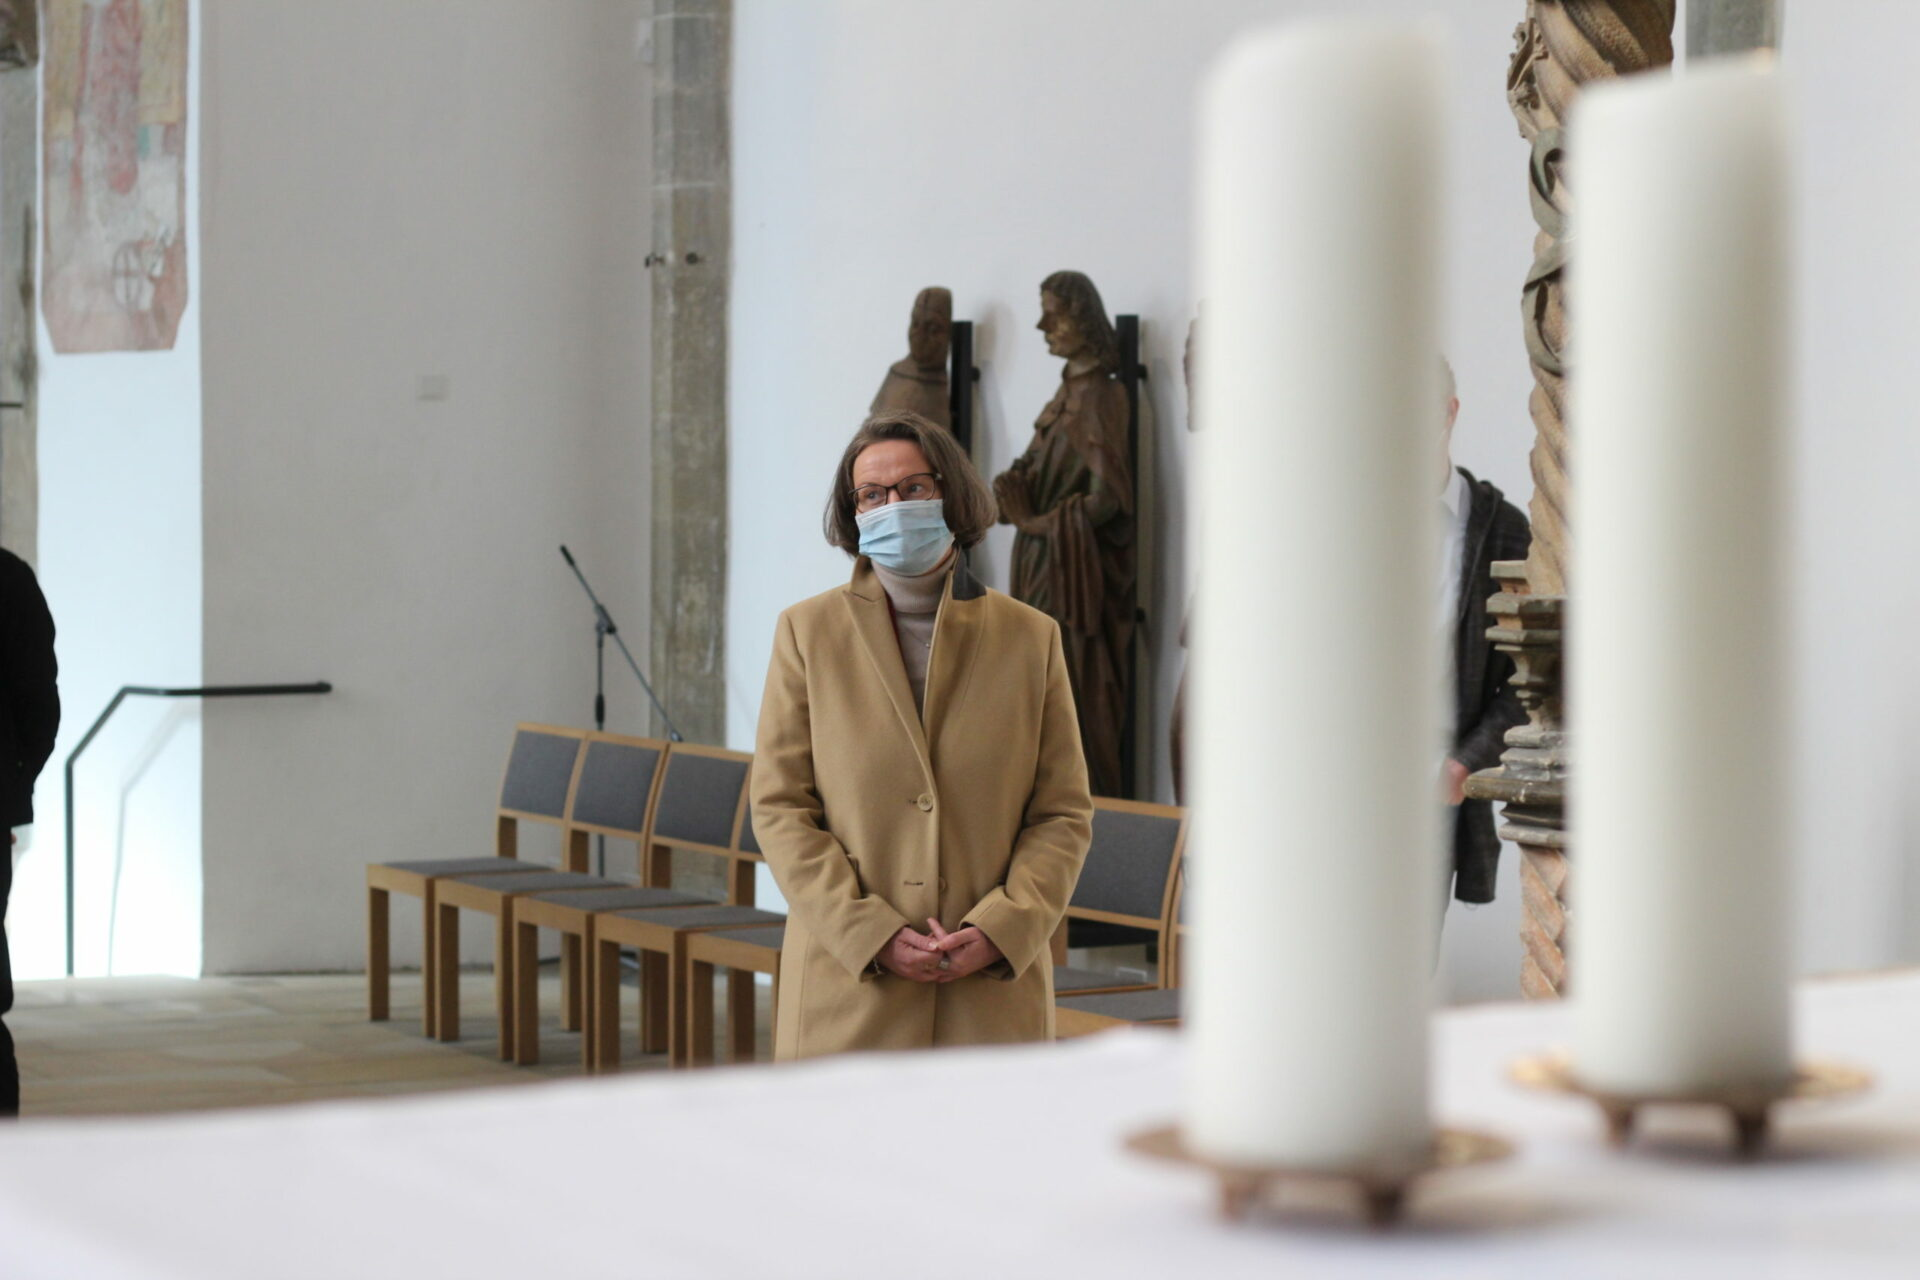 Scharrenbach hält Wort: St. Viktor erhält 400.000 Euro aus dem Förderprogramm Denkmalpflege